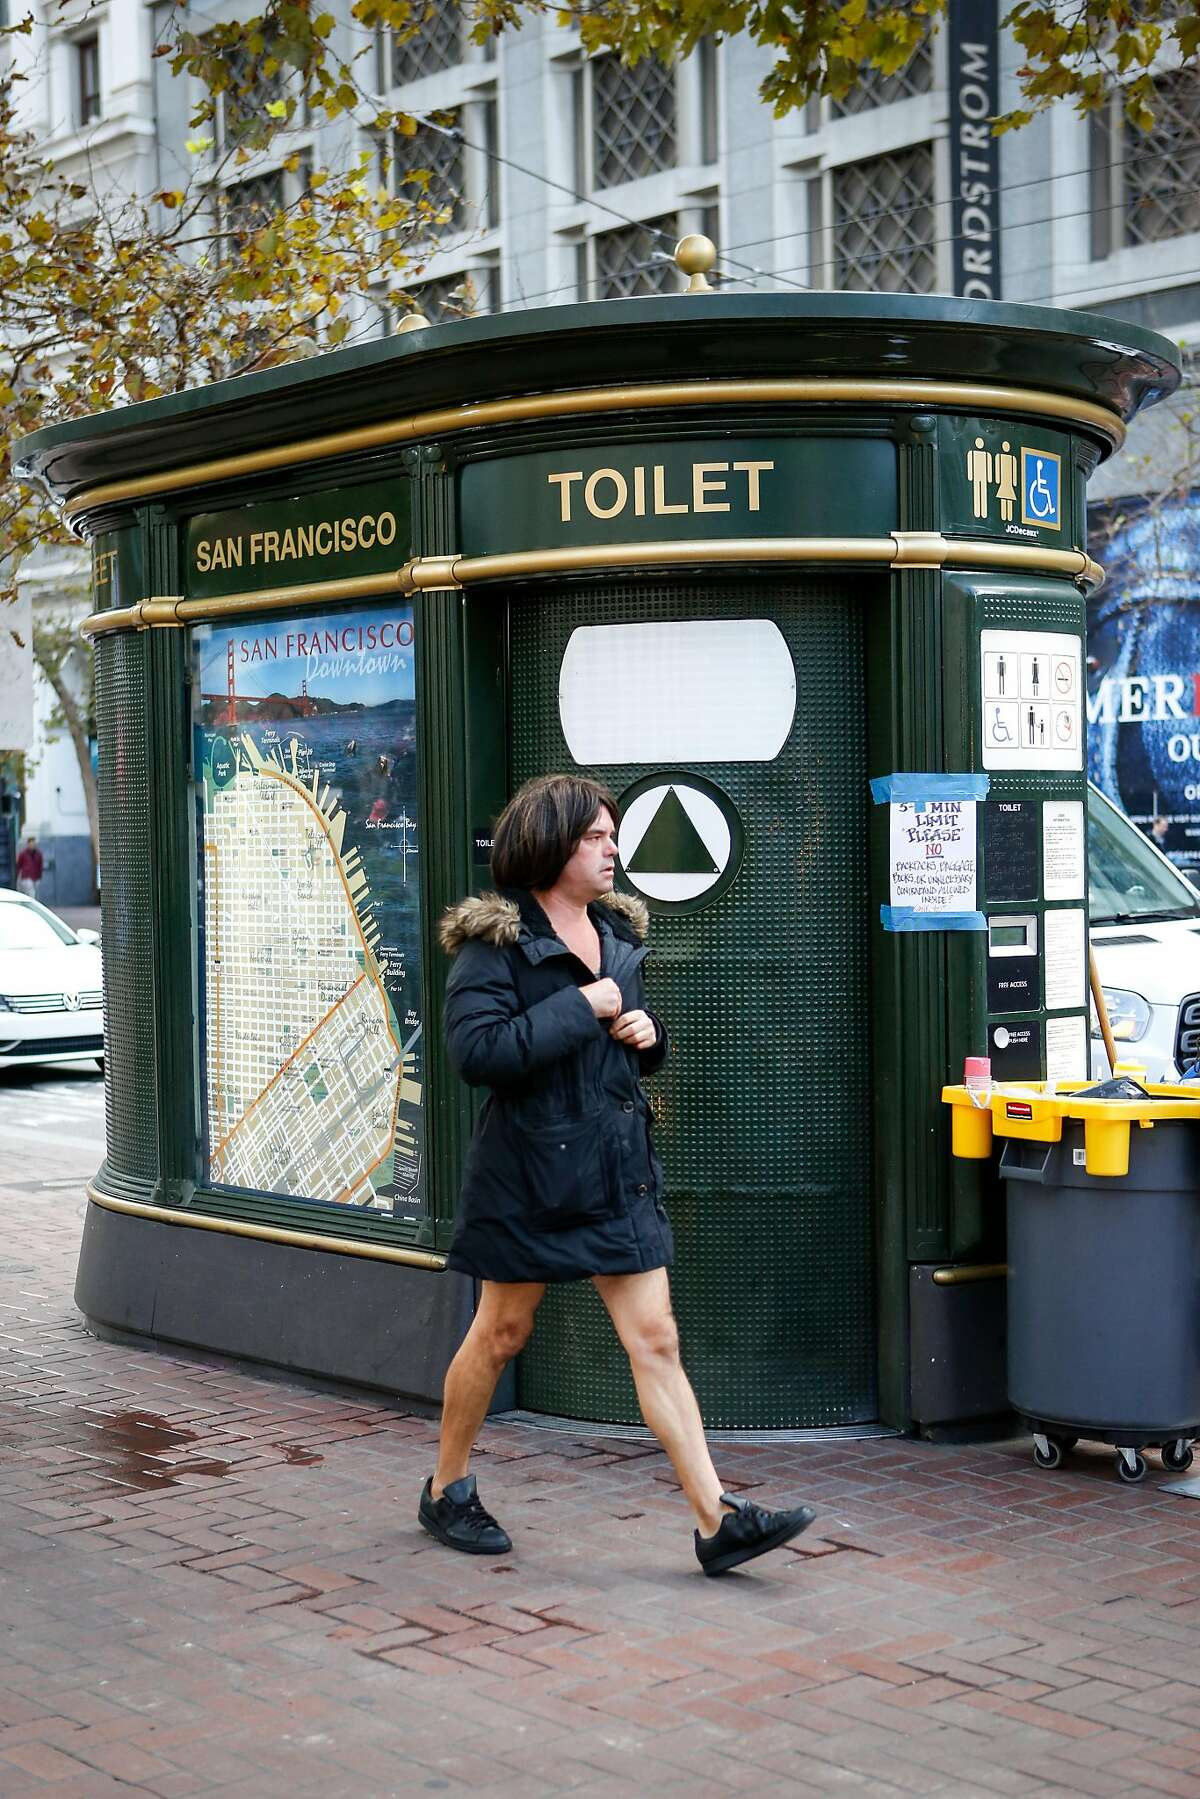 An public toilet seen on Market Street on Thursday, November 9, 2017 in San Francisco, Calif.